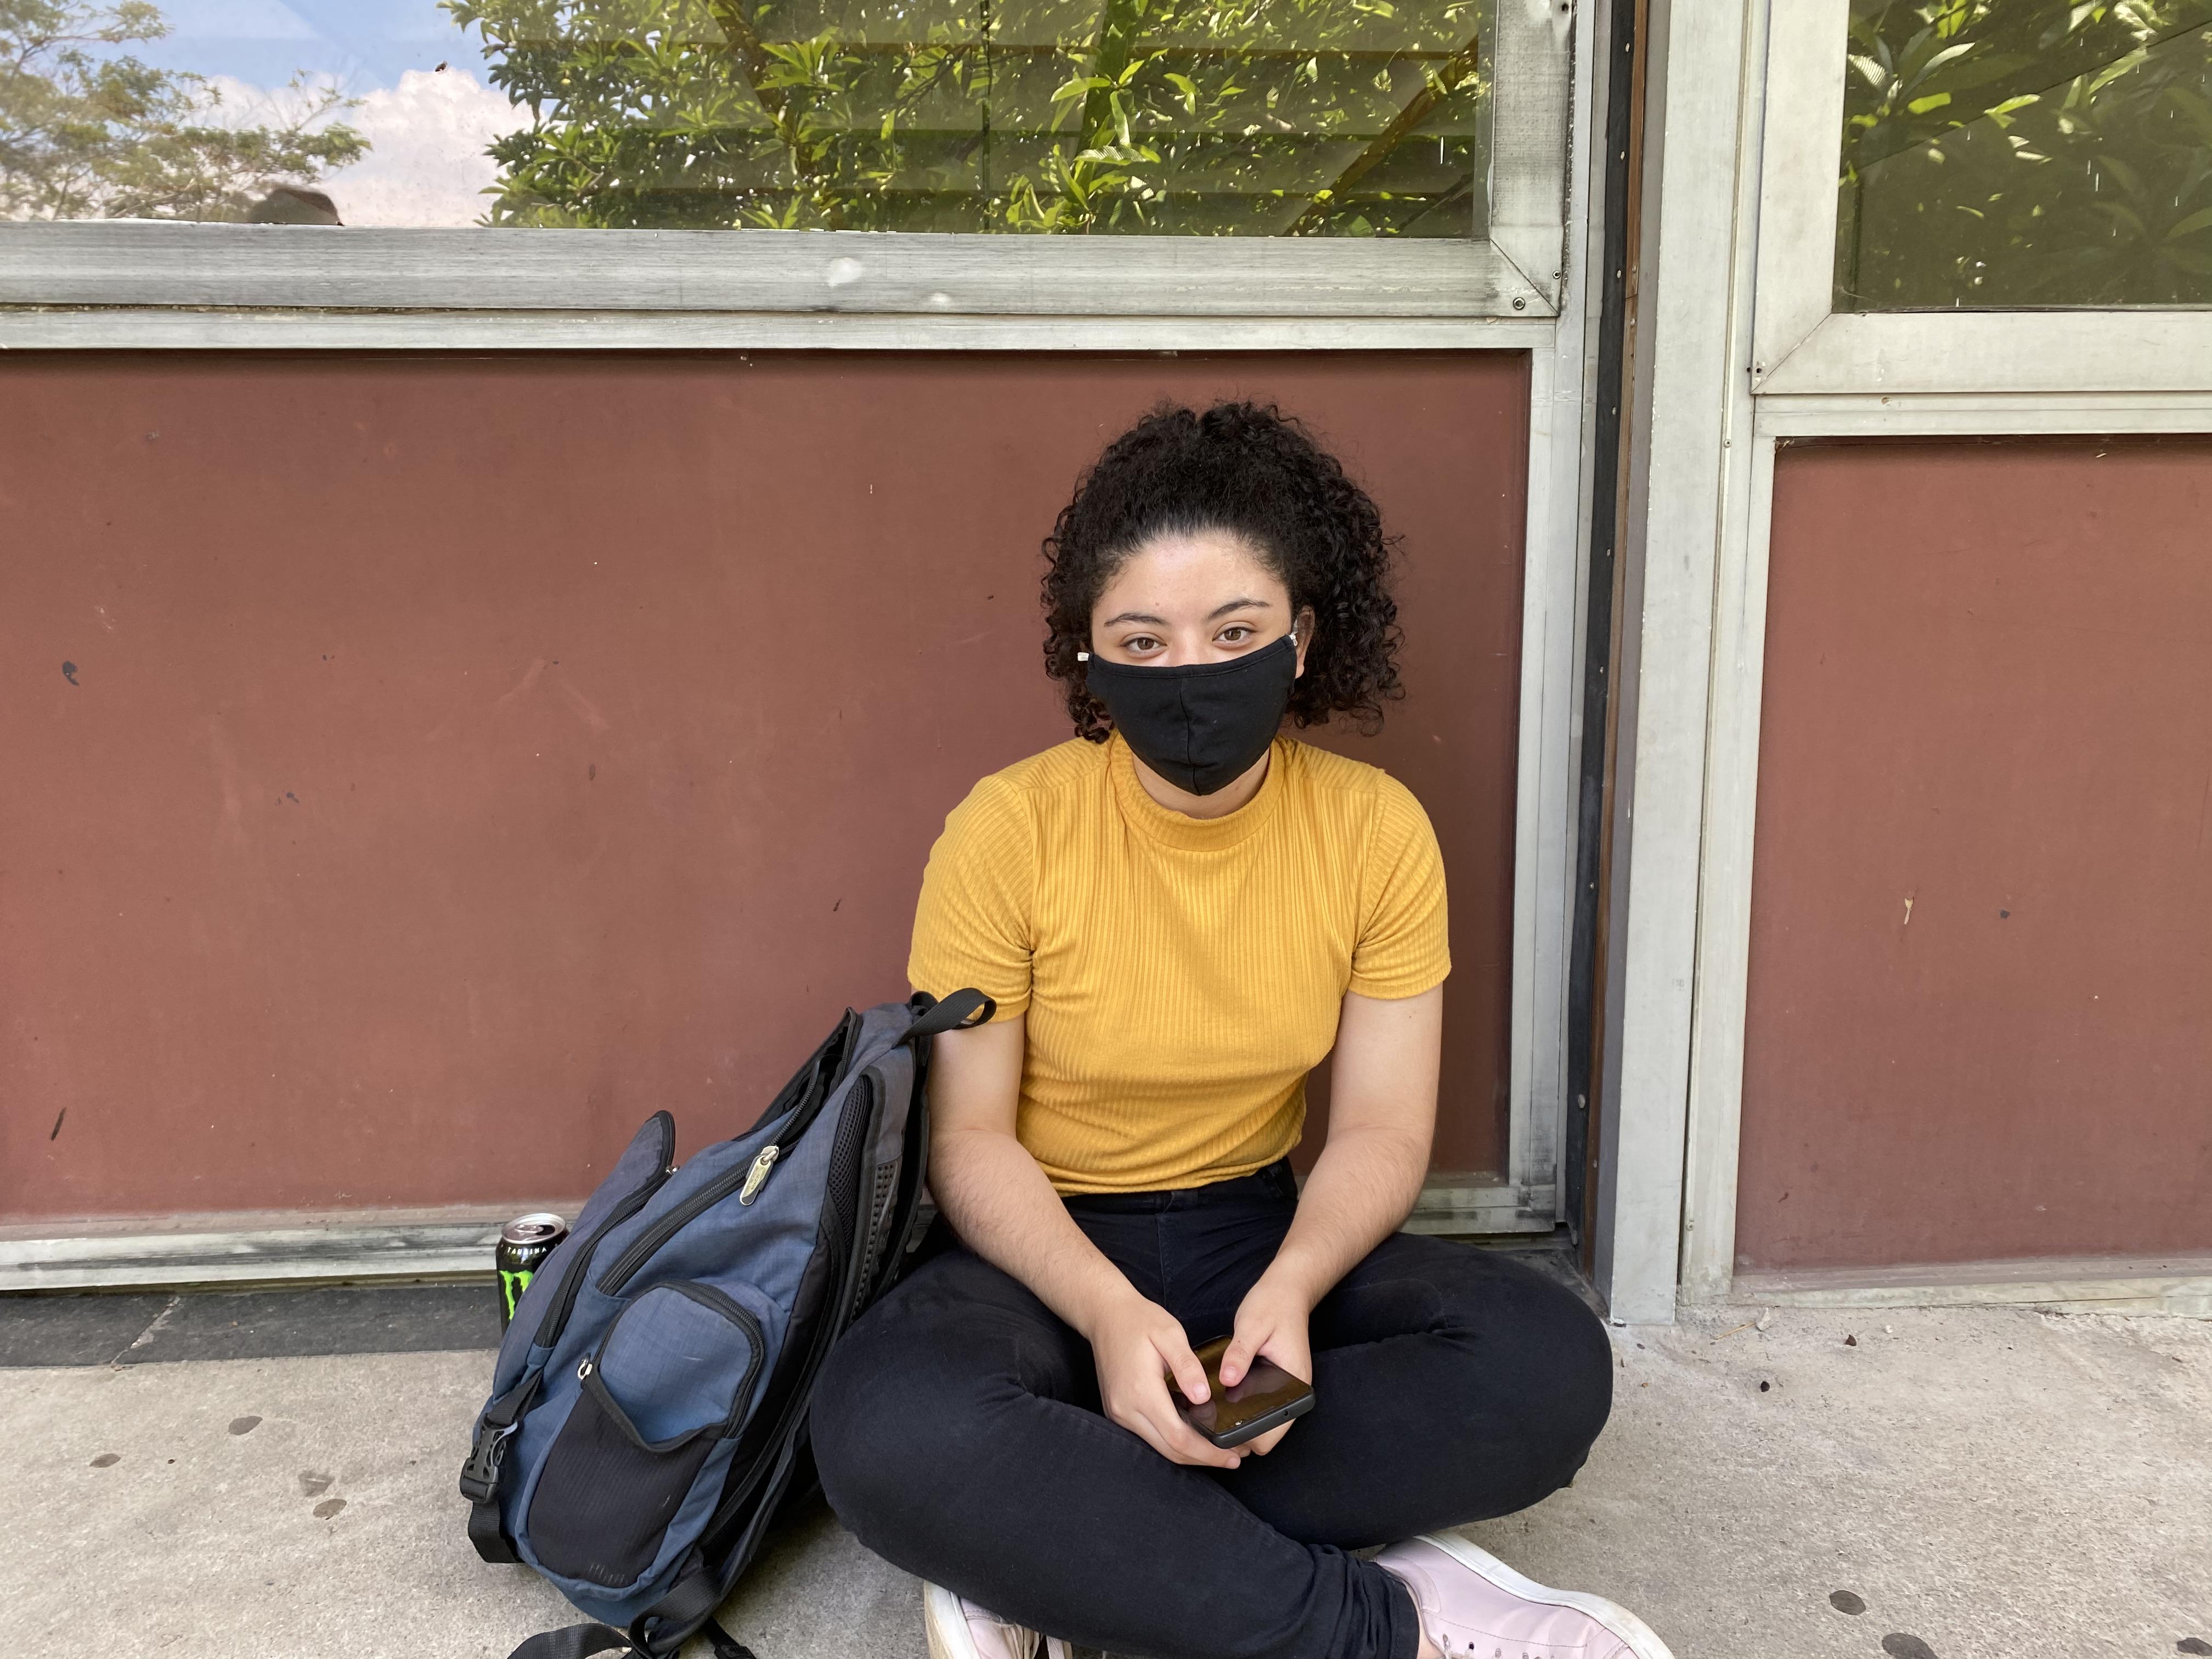 Estudante sentada no chão e de máscara.